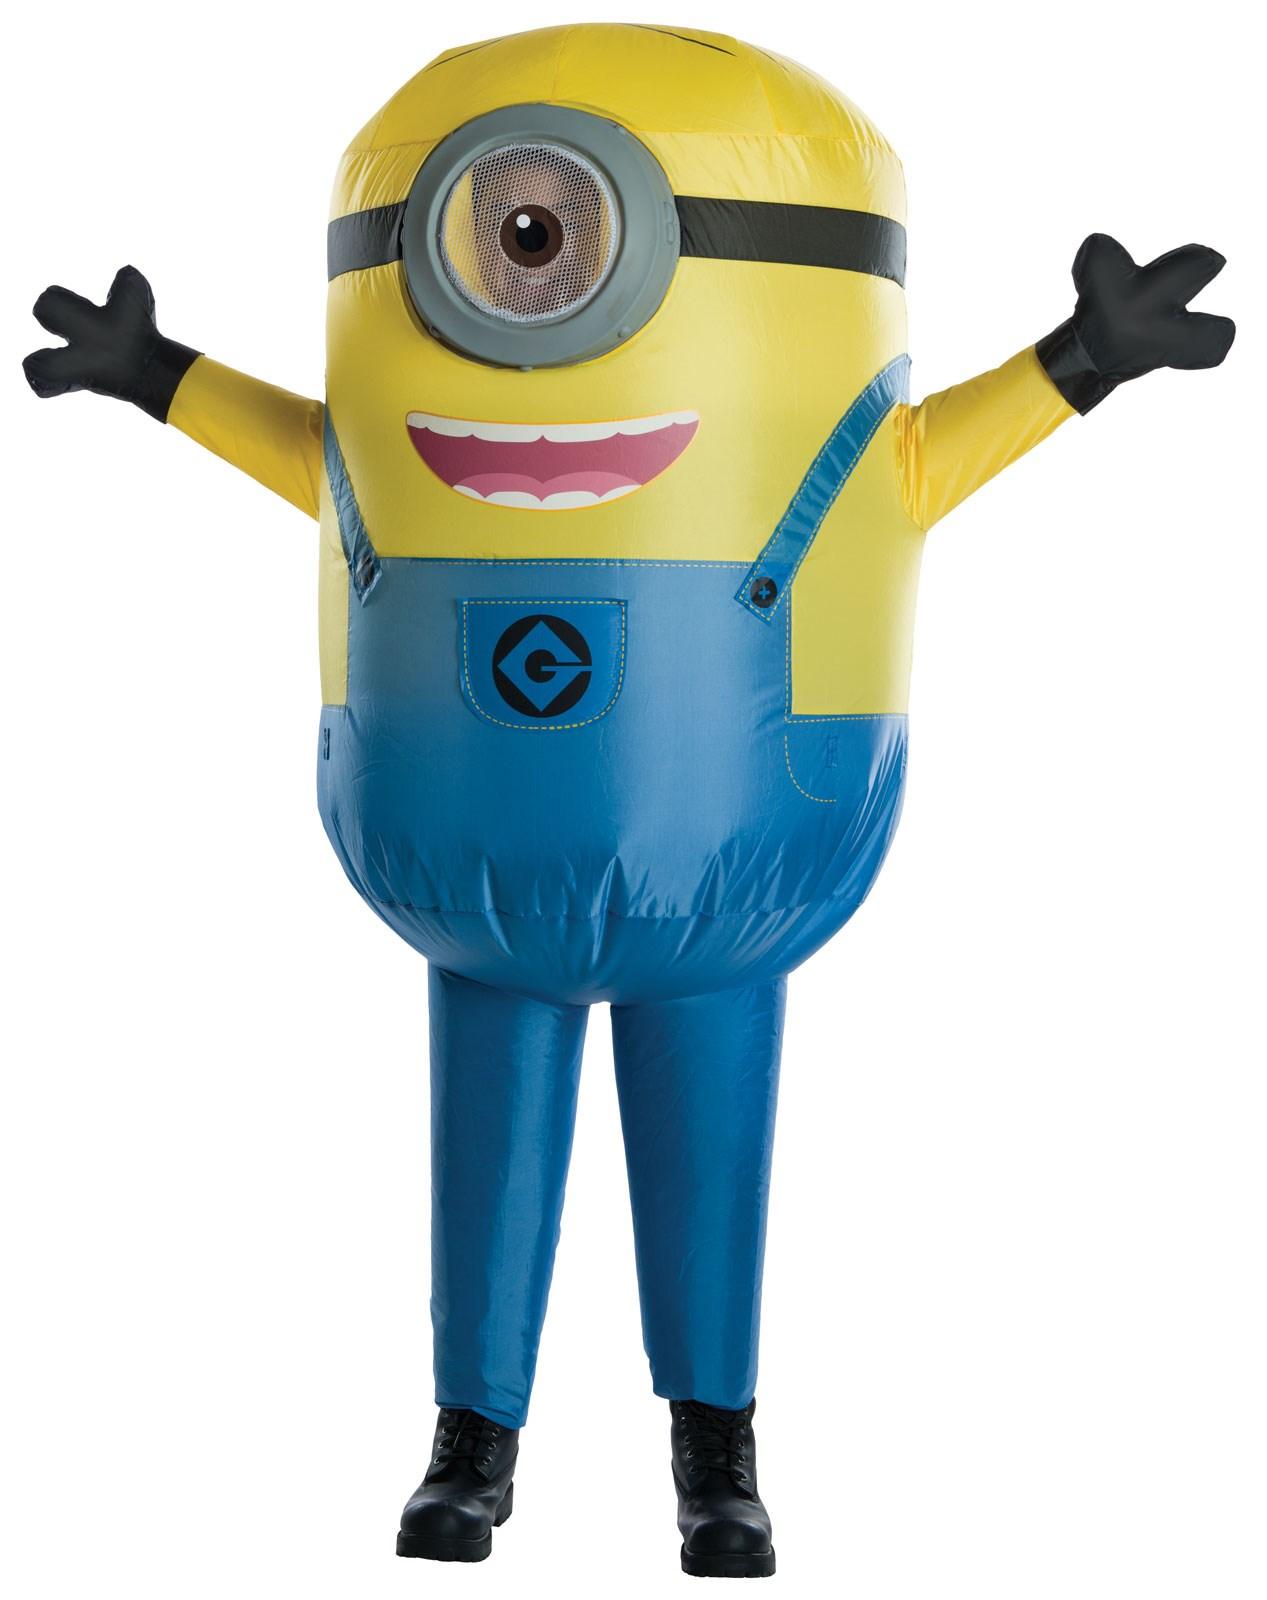 Despicable Me Minion Costumes | BuyCostumes.com